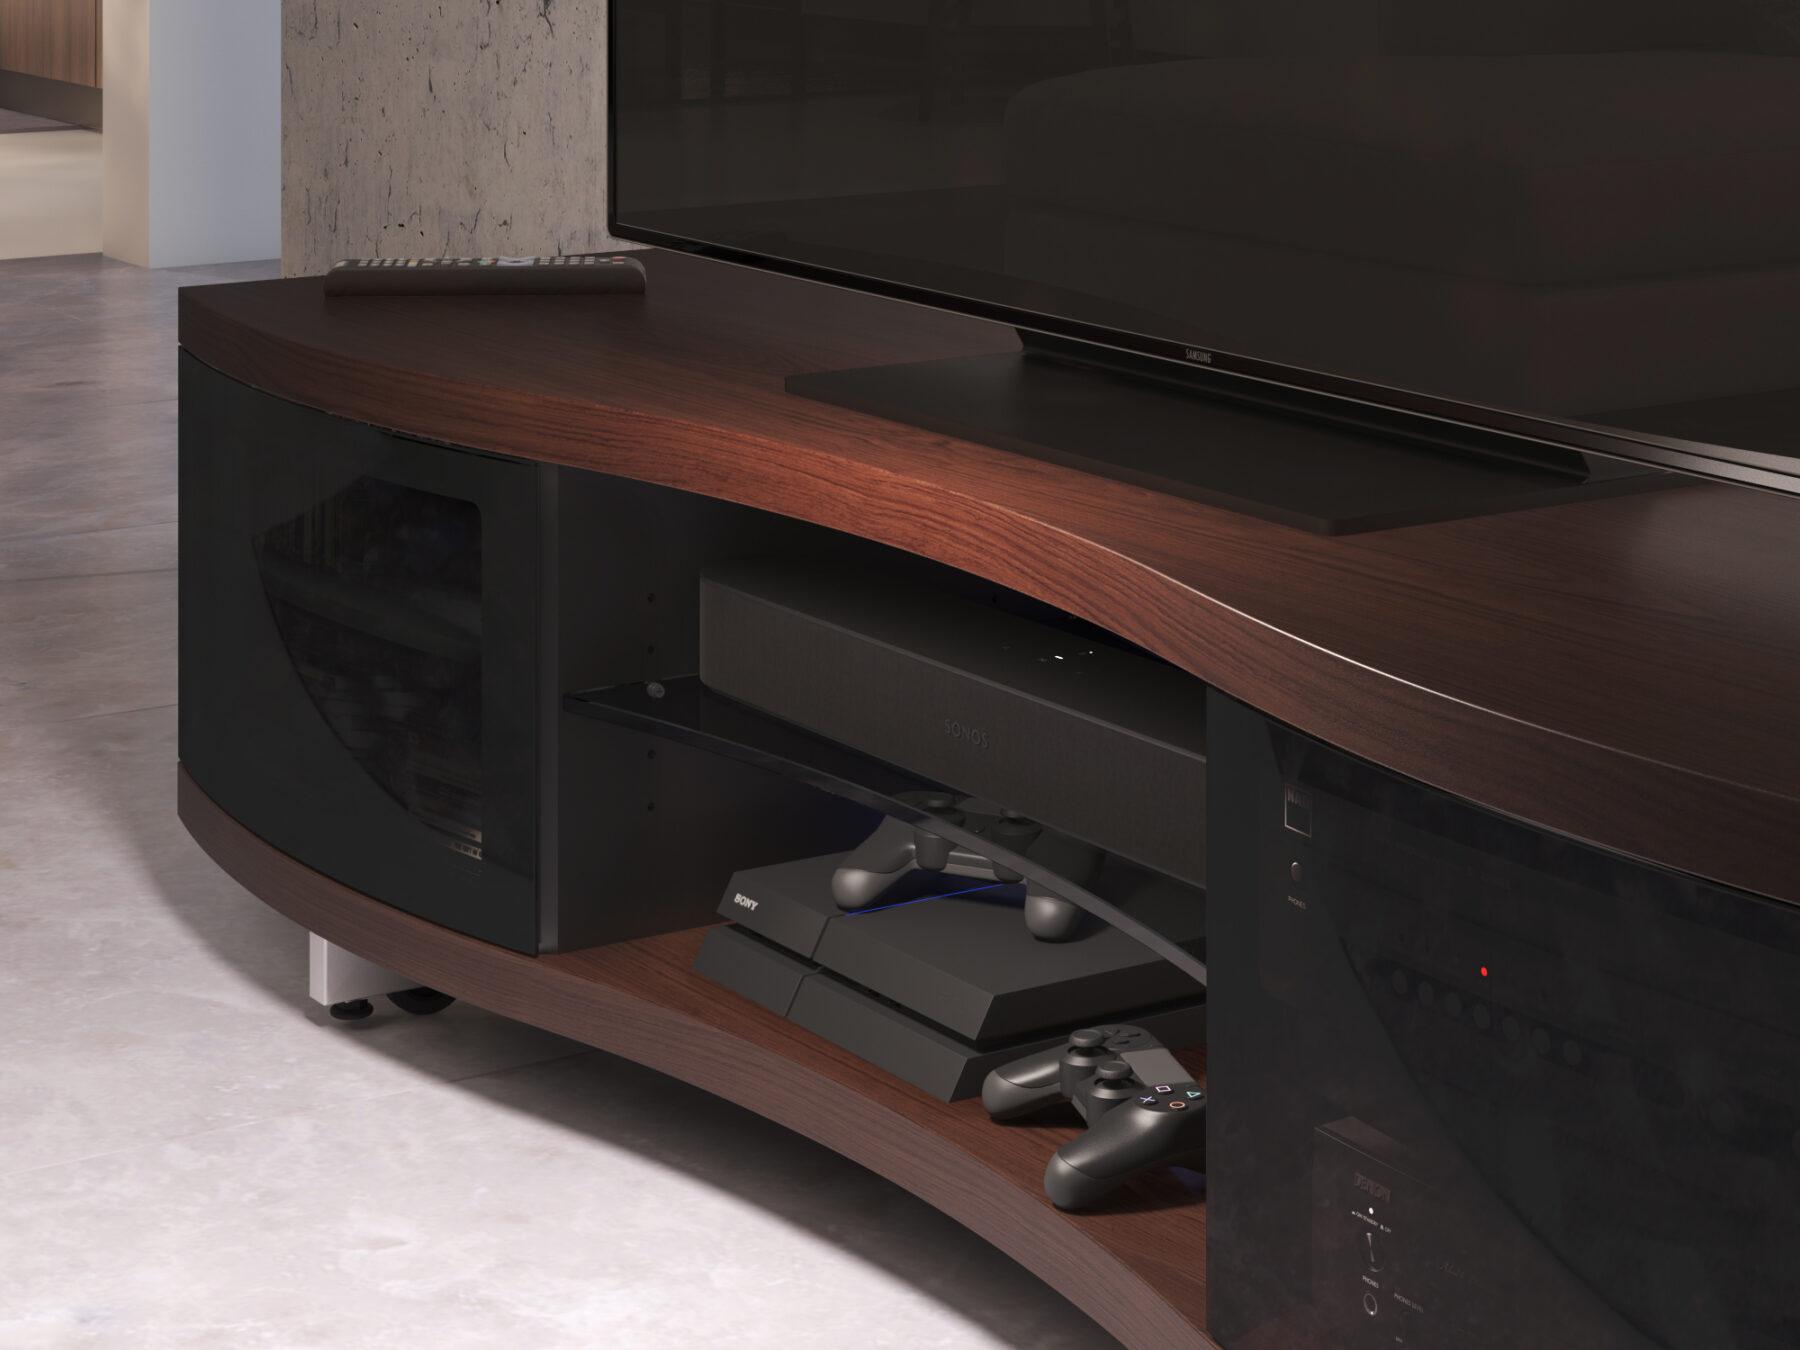 ola-8137-chocolate-bdi-modern-tv-cabinet-2